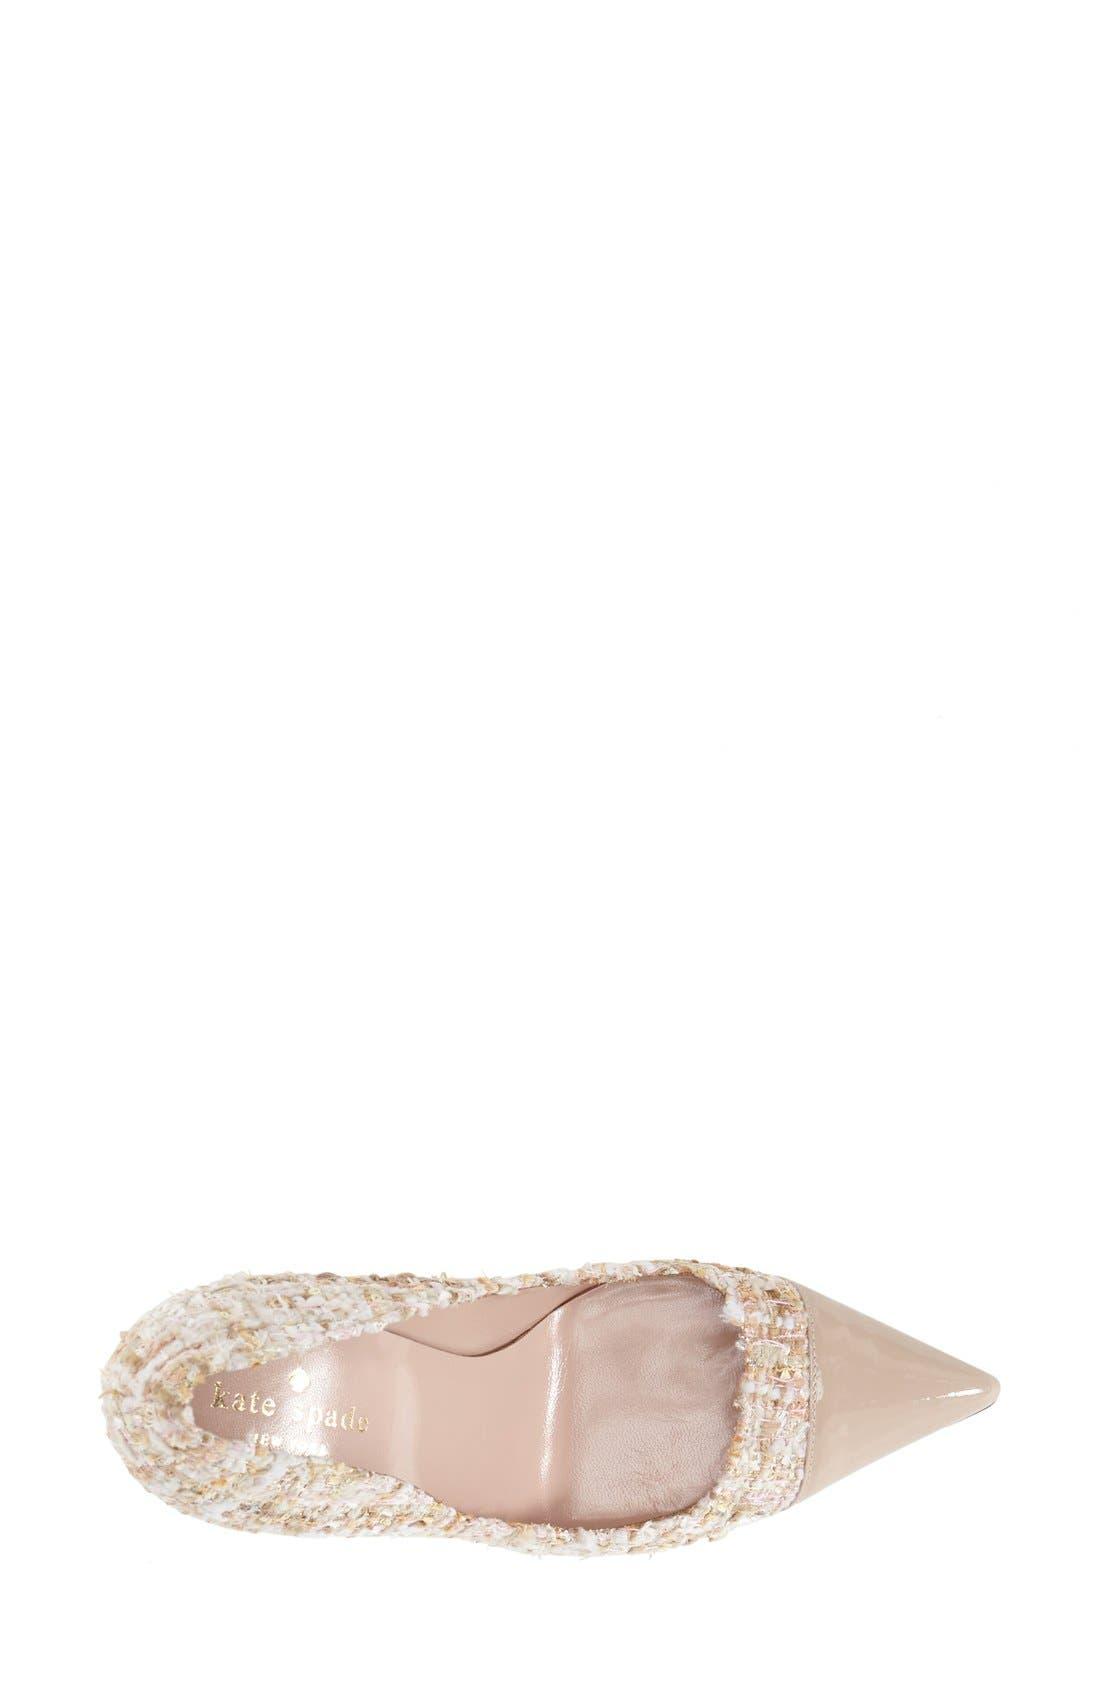 Alternate Image 3  - kate spade new york 'lacy' pointy toe pump (Women)